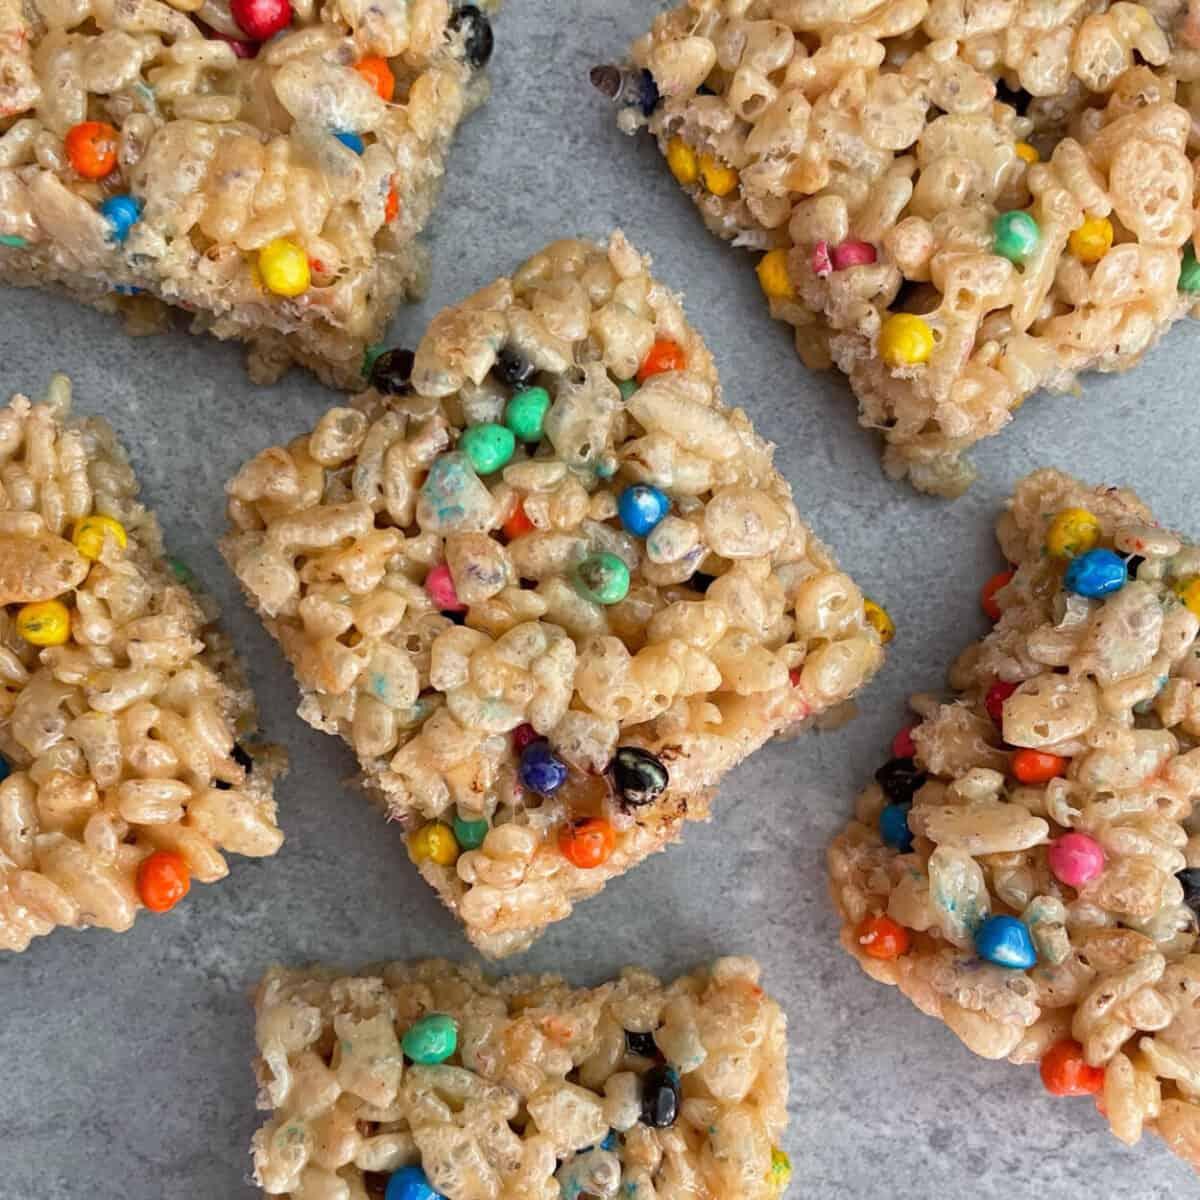 A Peanut Butter Rice Krispie Treats Recipe